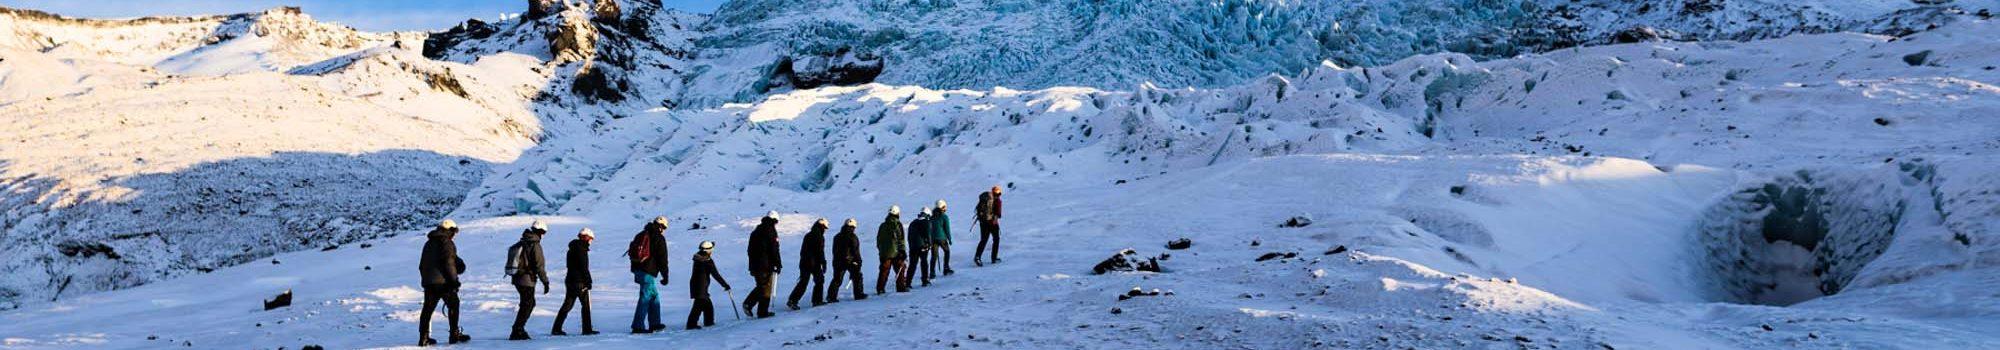 Glacier hiking on Falljokull glacier